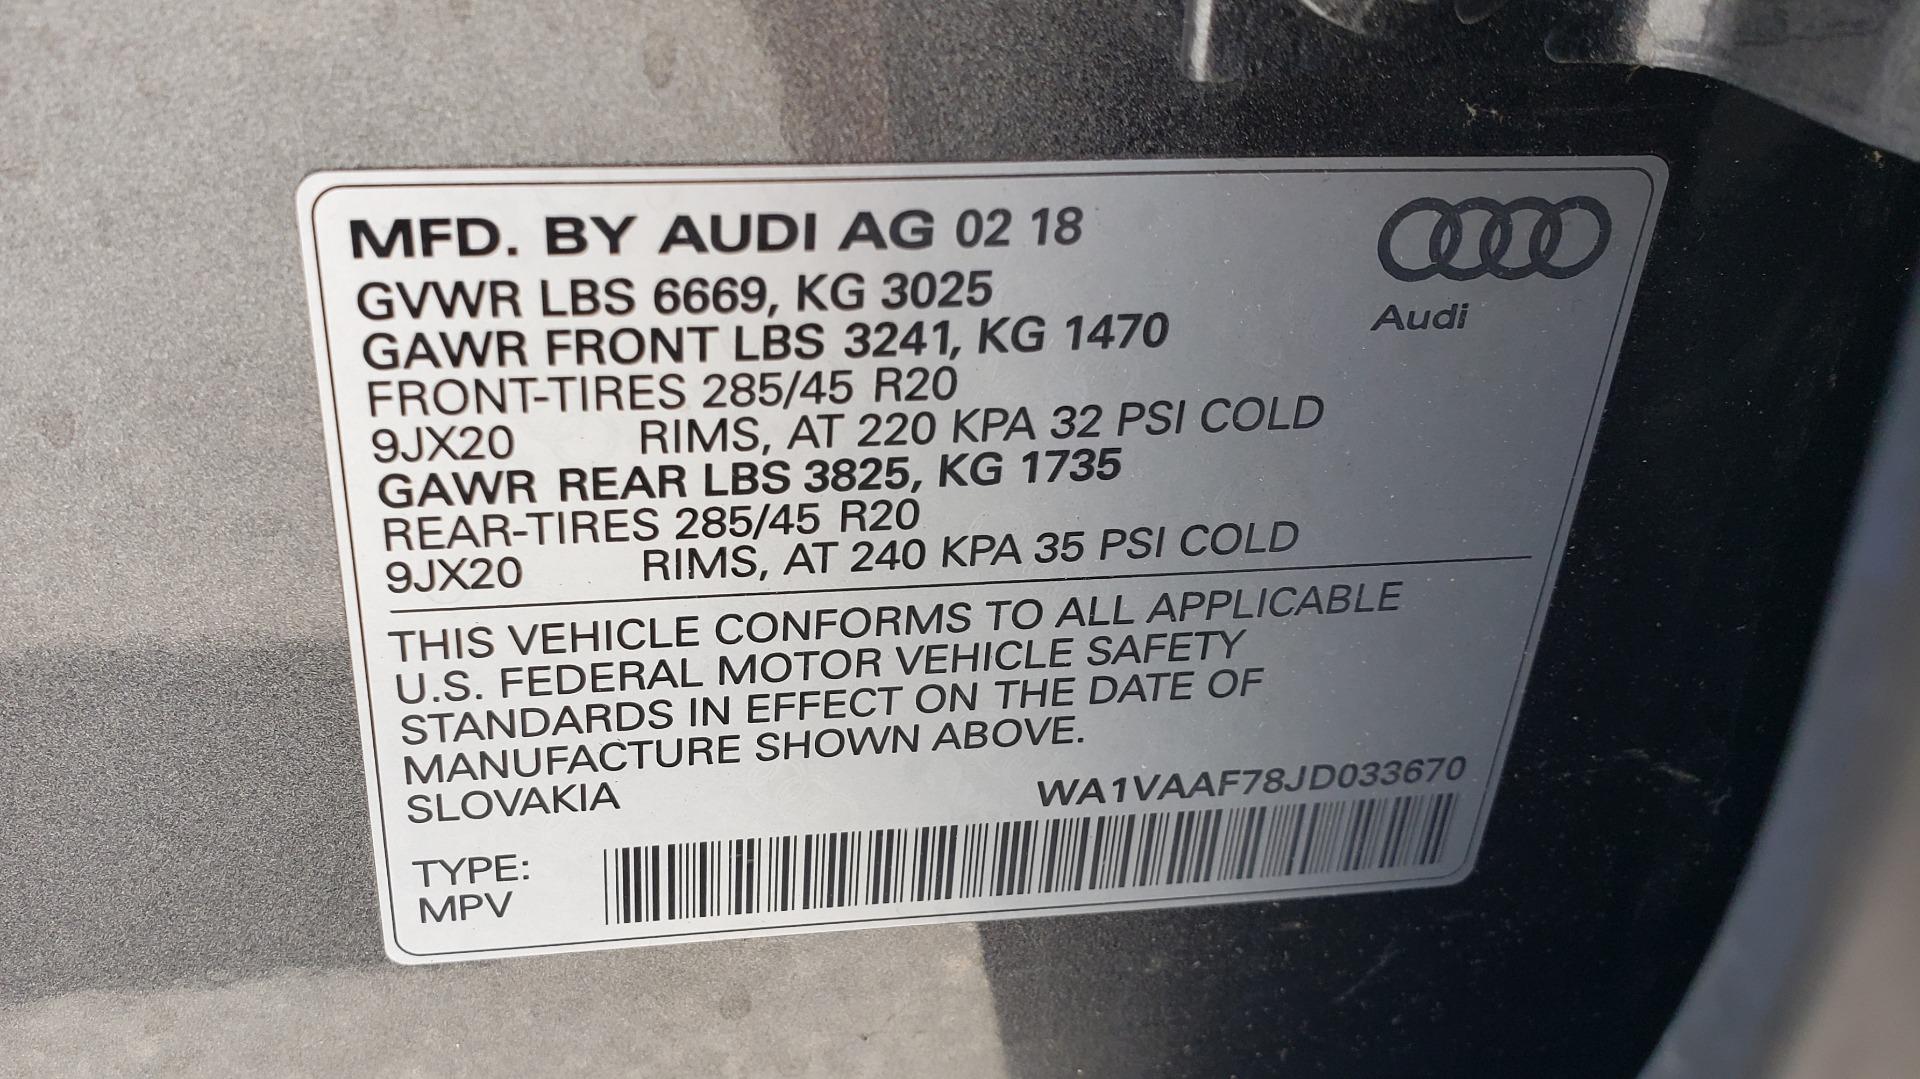 Used 2018 Audi Q7 PRESTIGE TIPTRONIC / NAV / SUNROOF / ADAPTIVE PKG / DRVR ASST / CLD WTHR /  for sale $49,995 at Formula Imports in Charlotte NC 28227 99